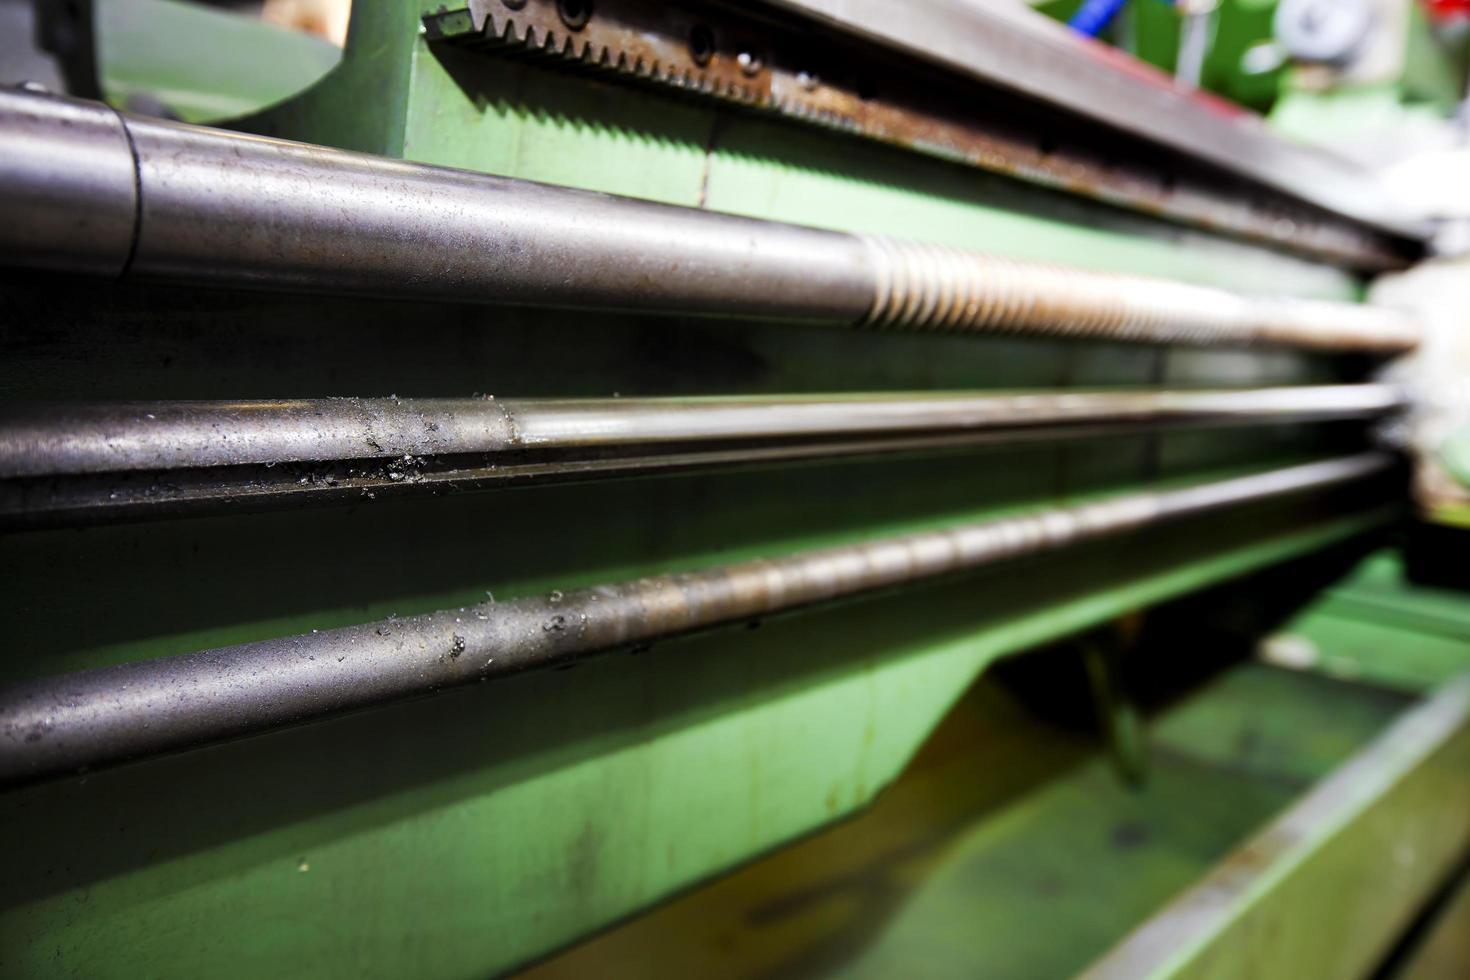 usine industrielle technologique machines fabrication photo